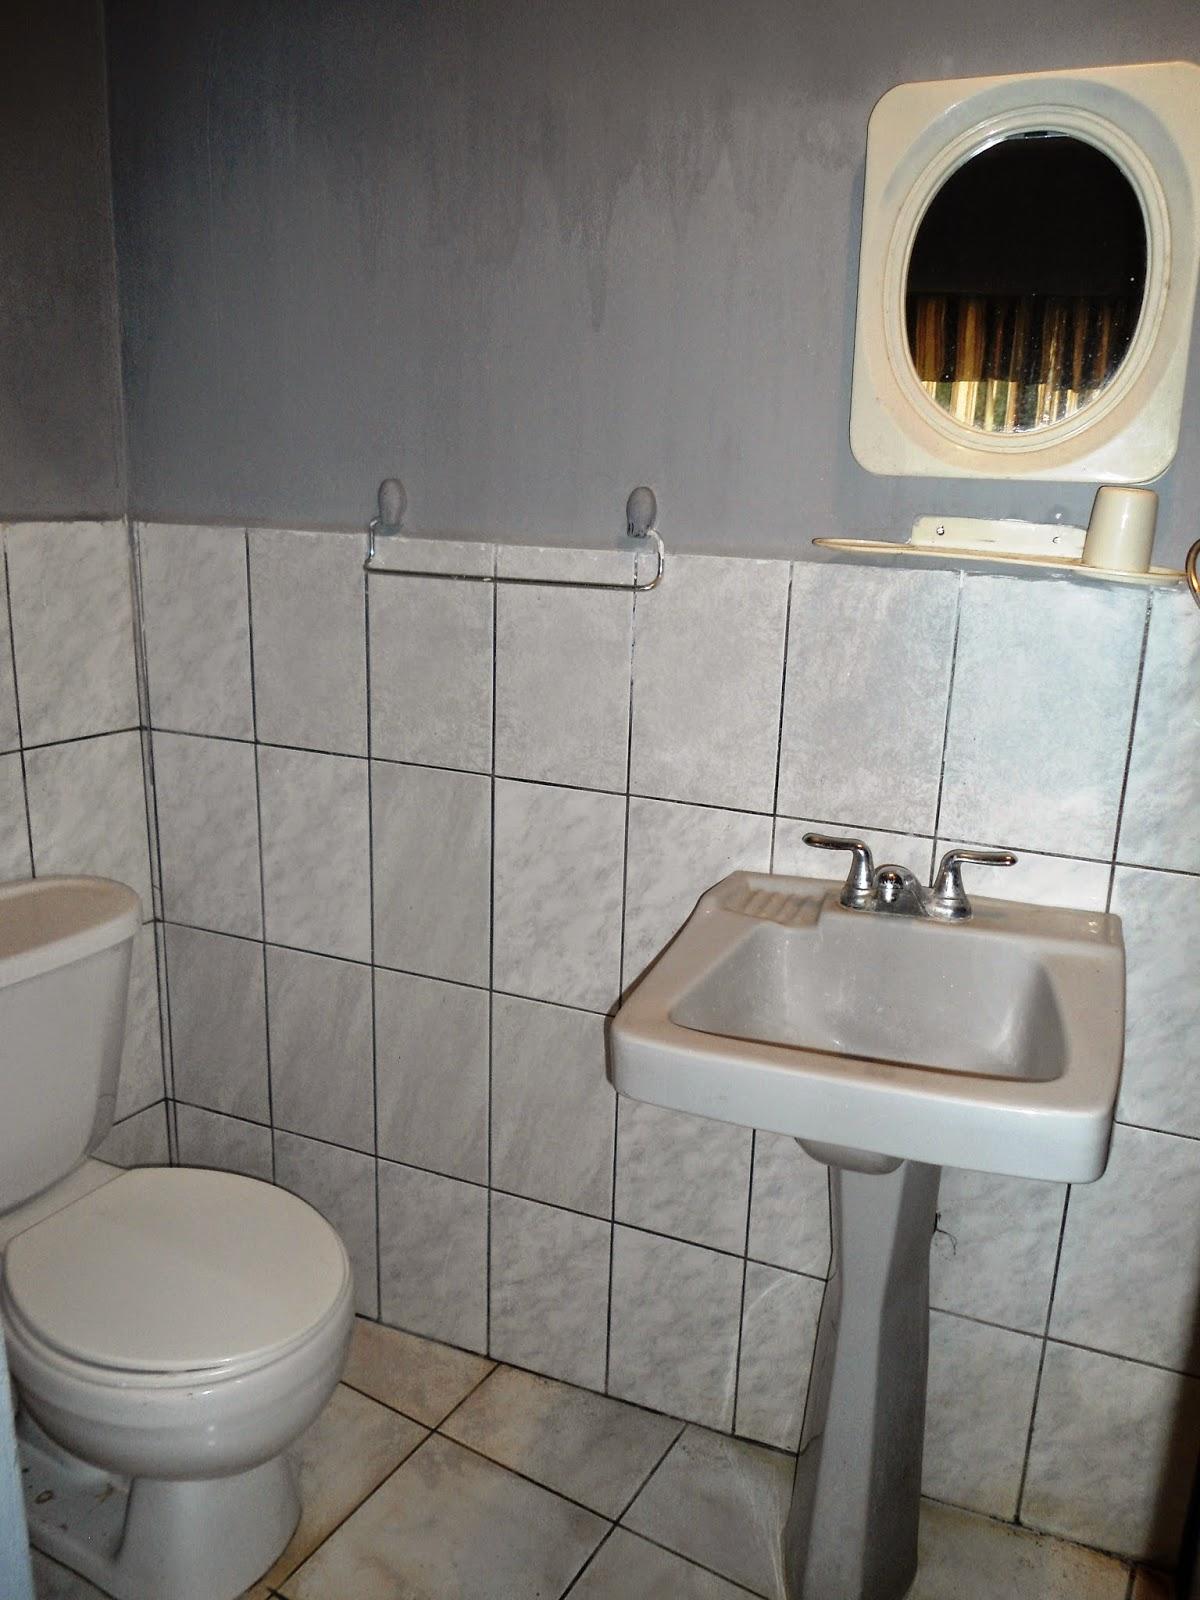 ALQUILER APARTAMENTOS CARAZO  Se renta comodo apartamento